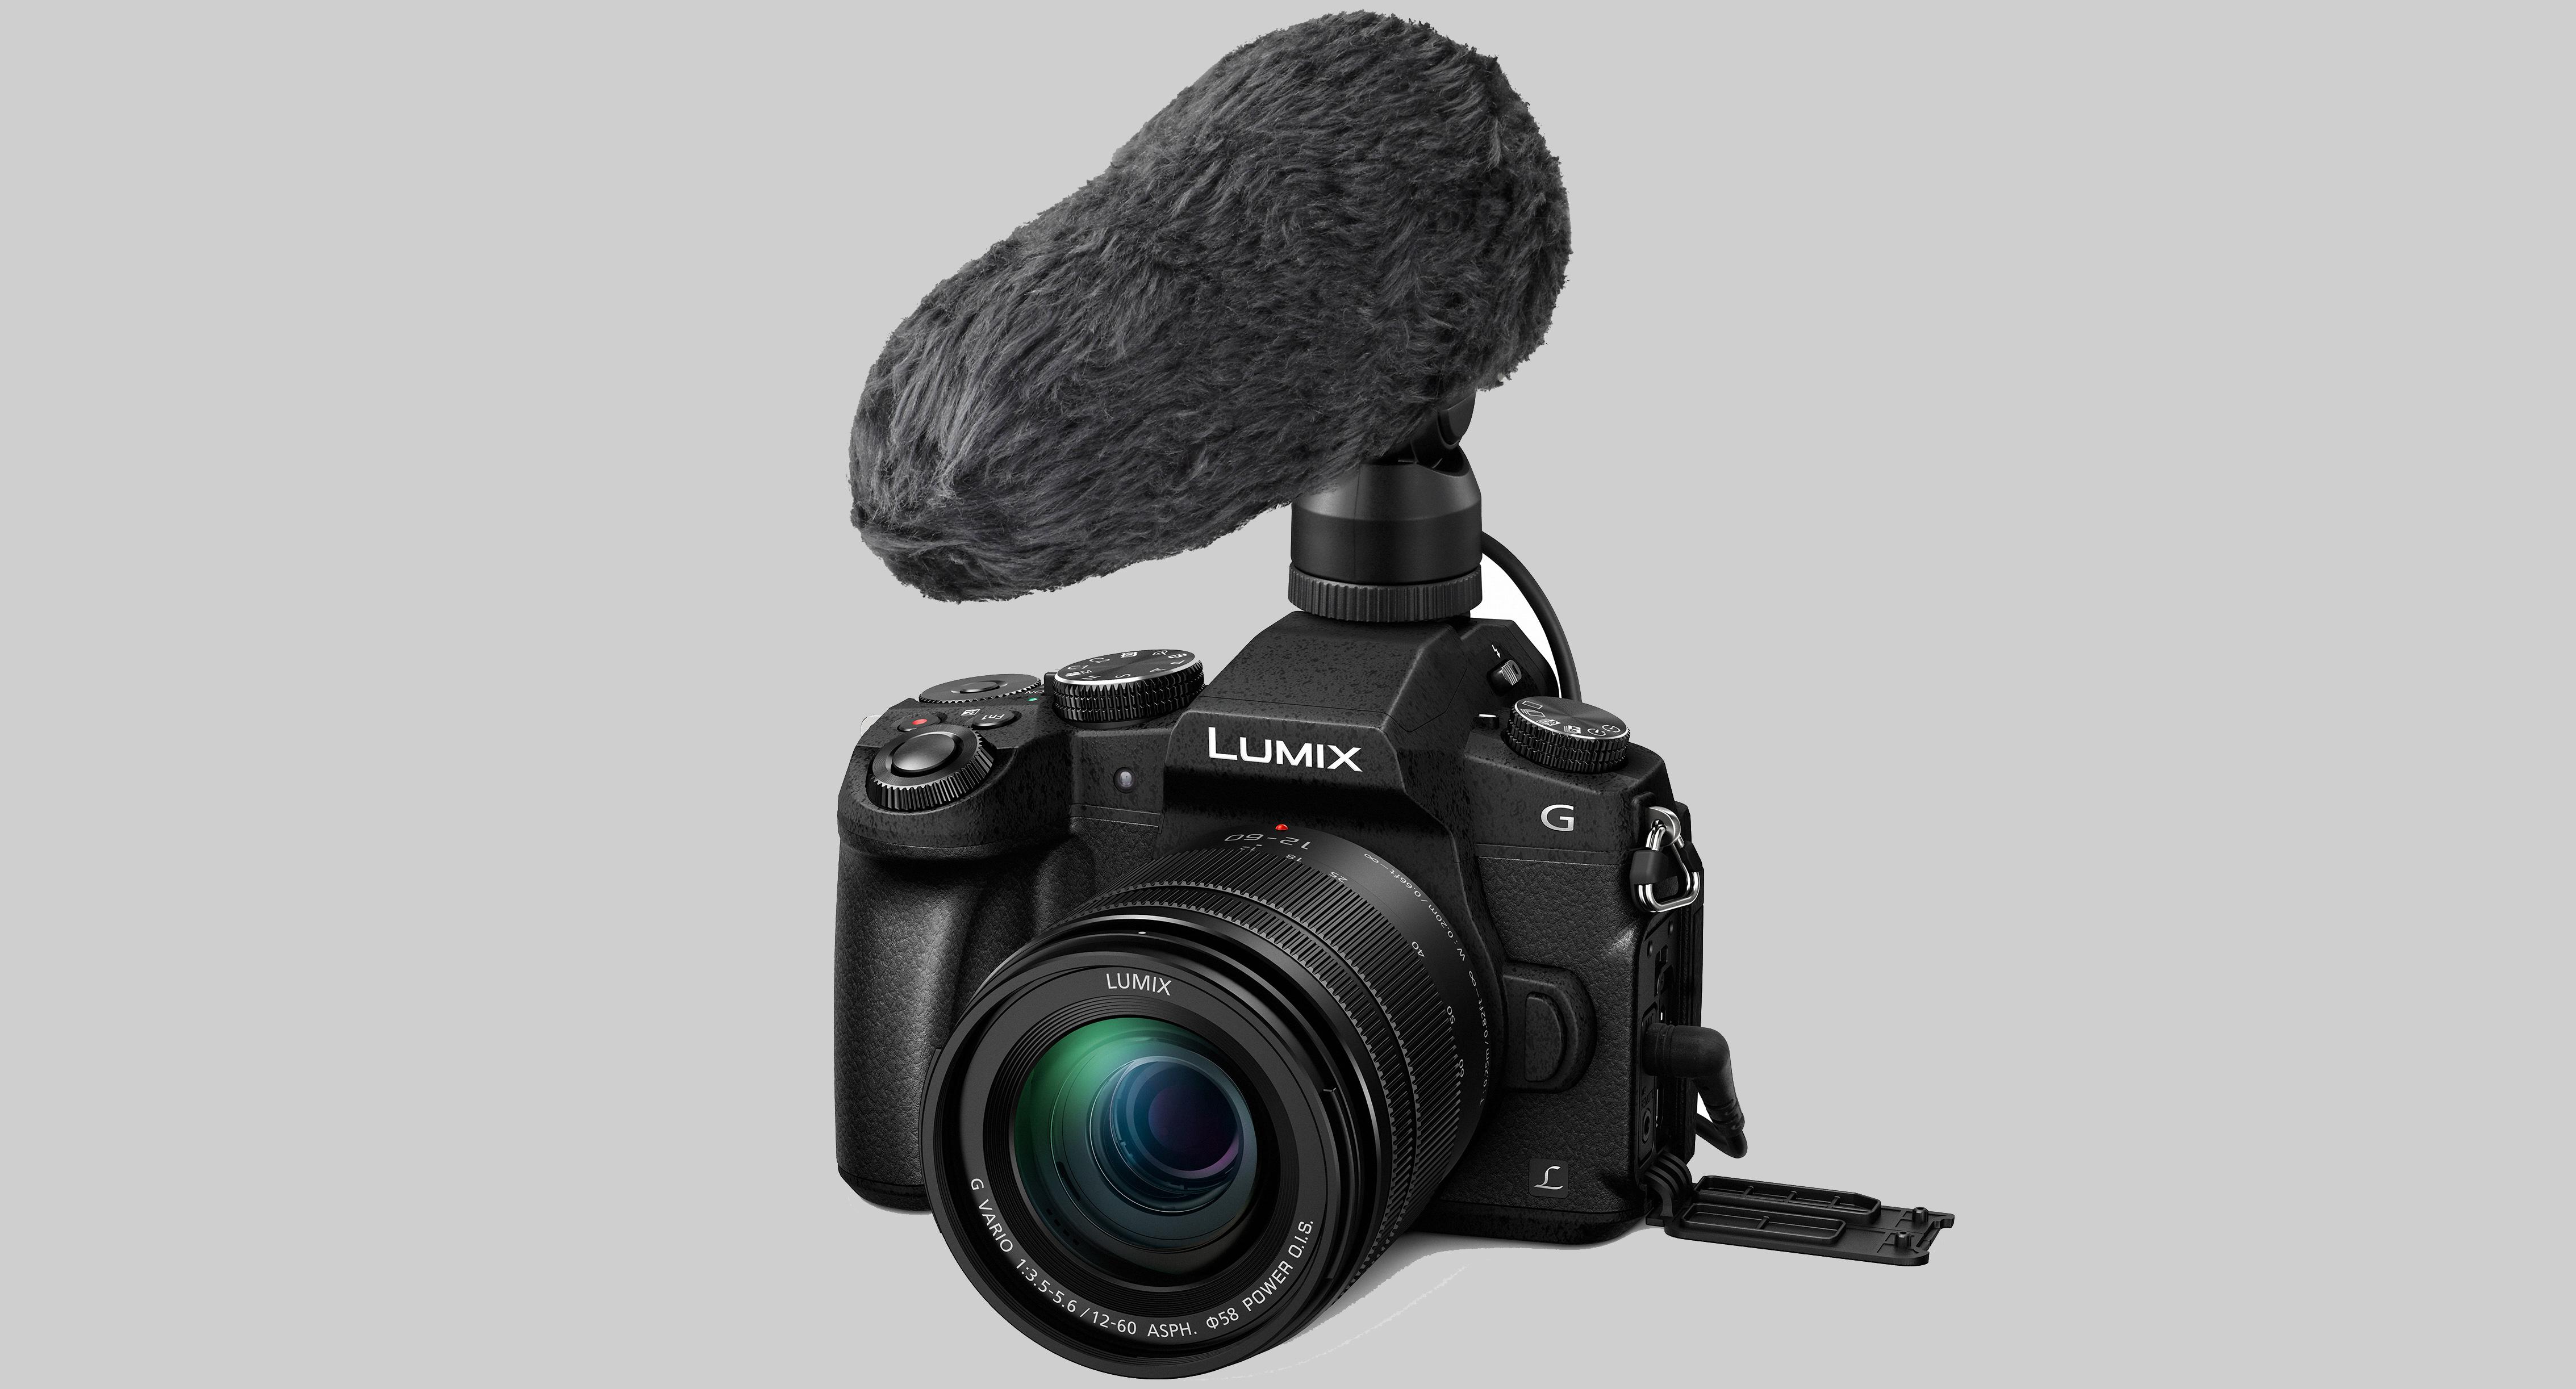 Panasonic Lumix G80